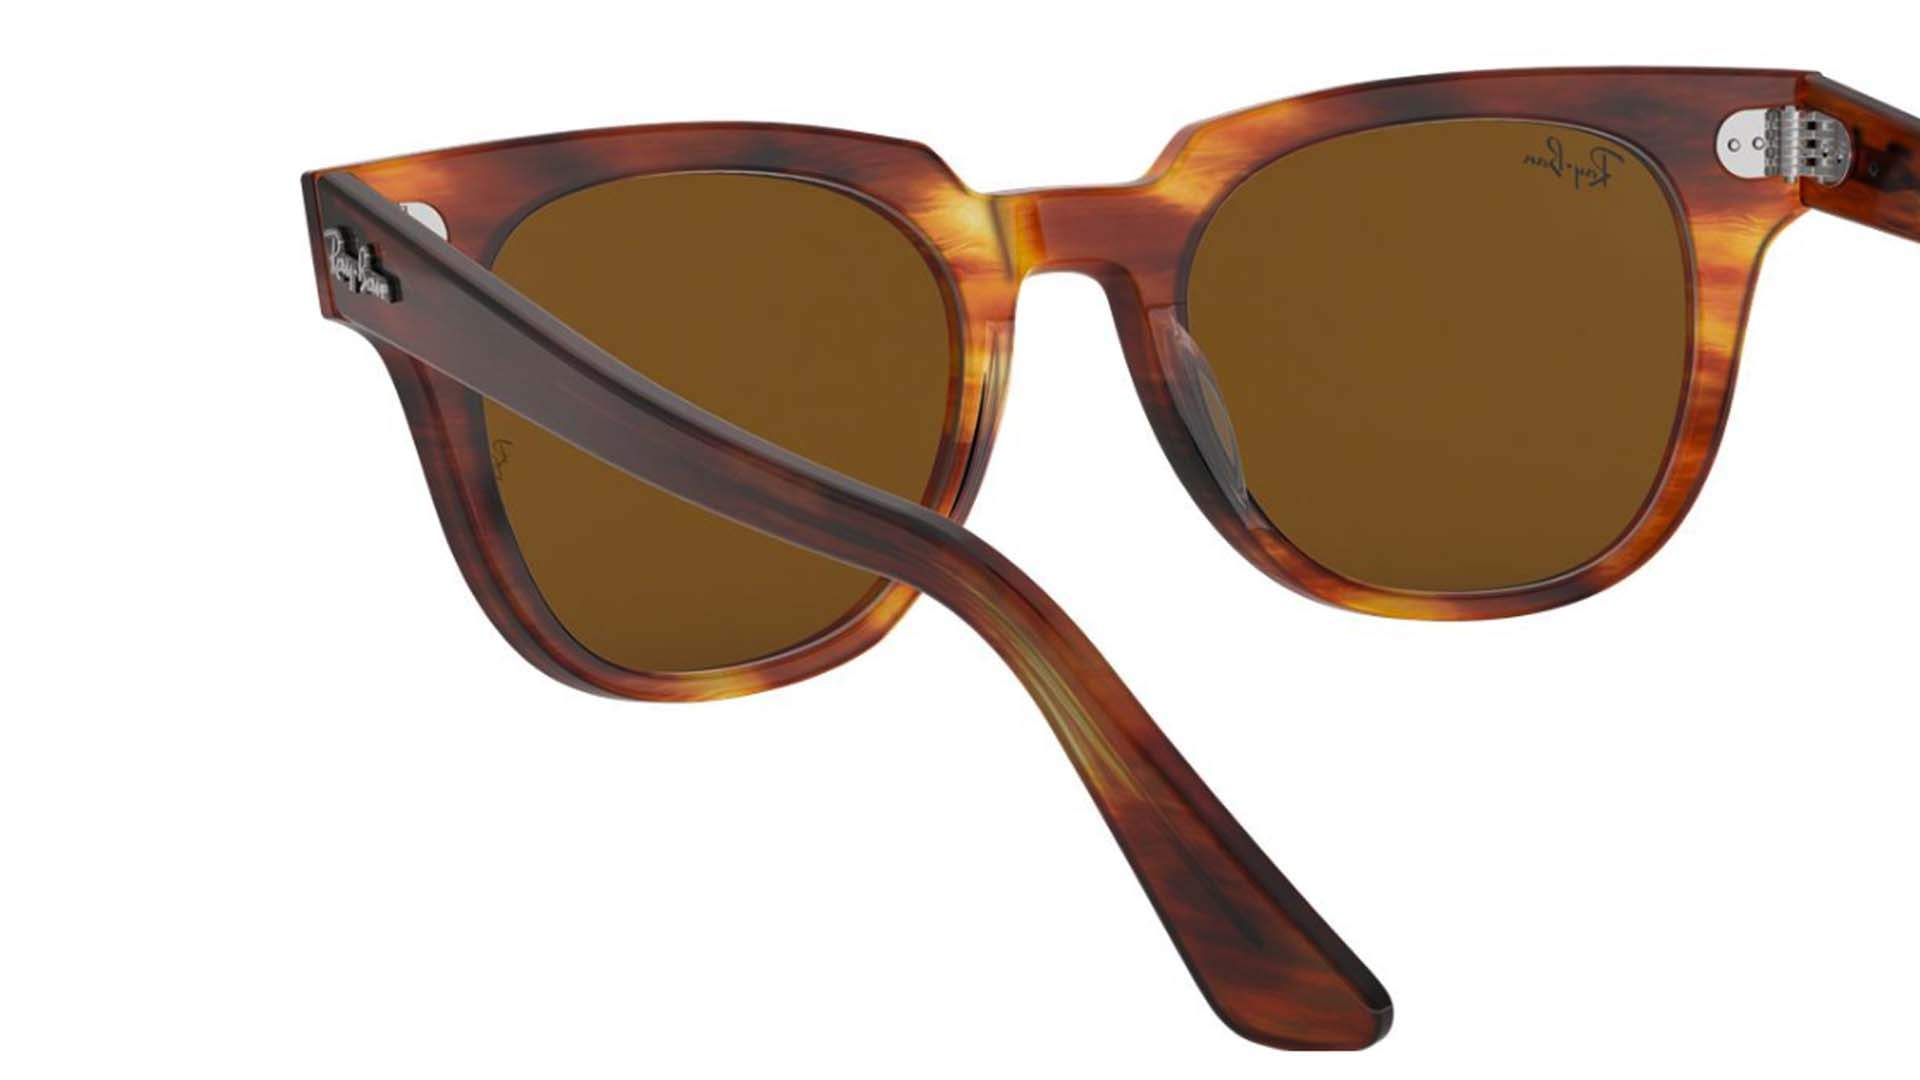 ce31f1beb8 Sunglasses Ray-Ban Meteor Tortoise B15 RB2168 954 33 50-20 Medium